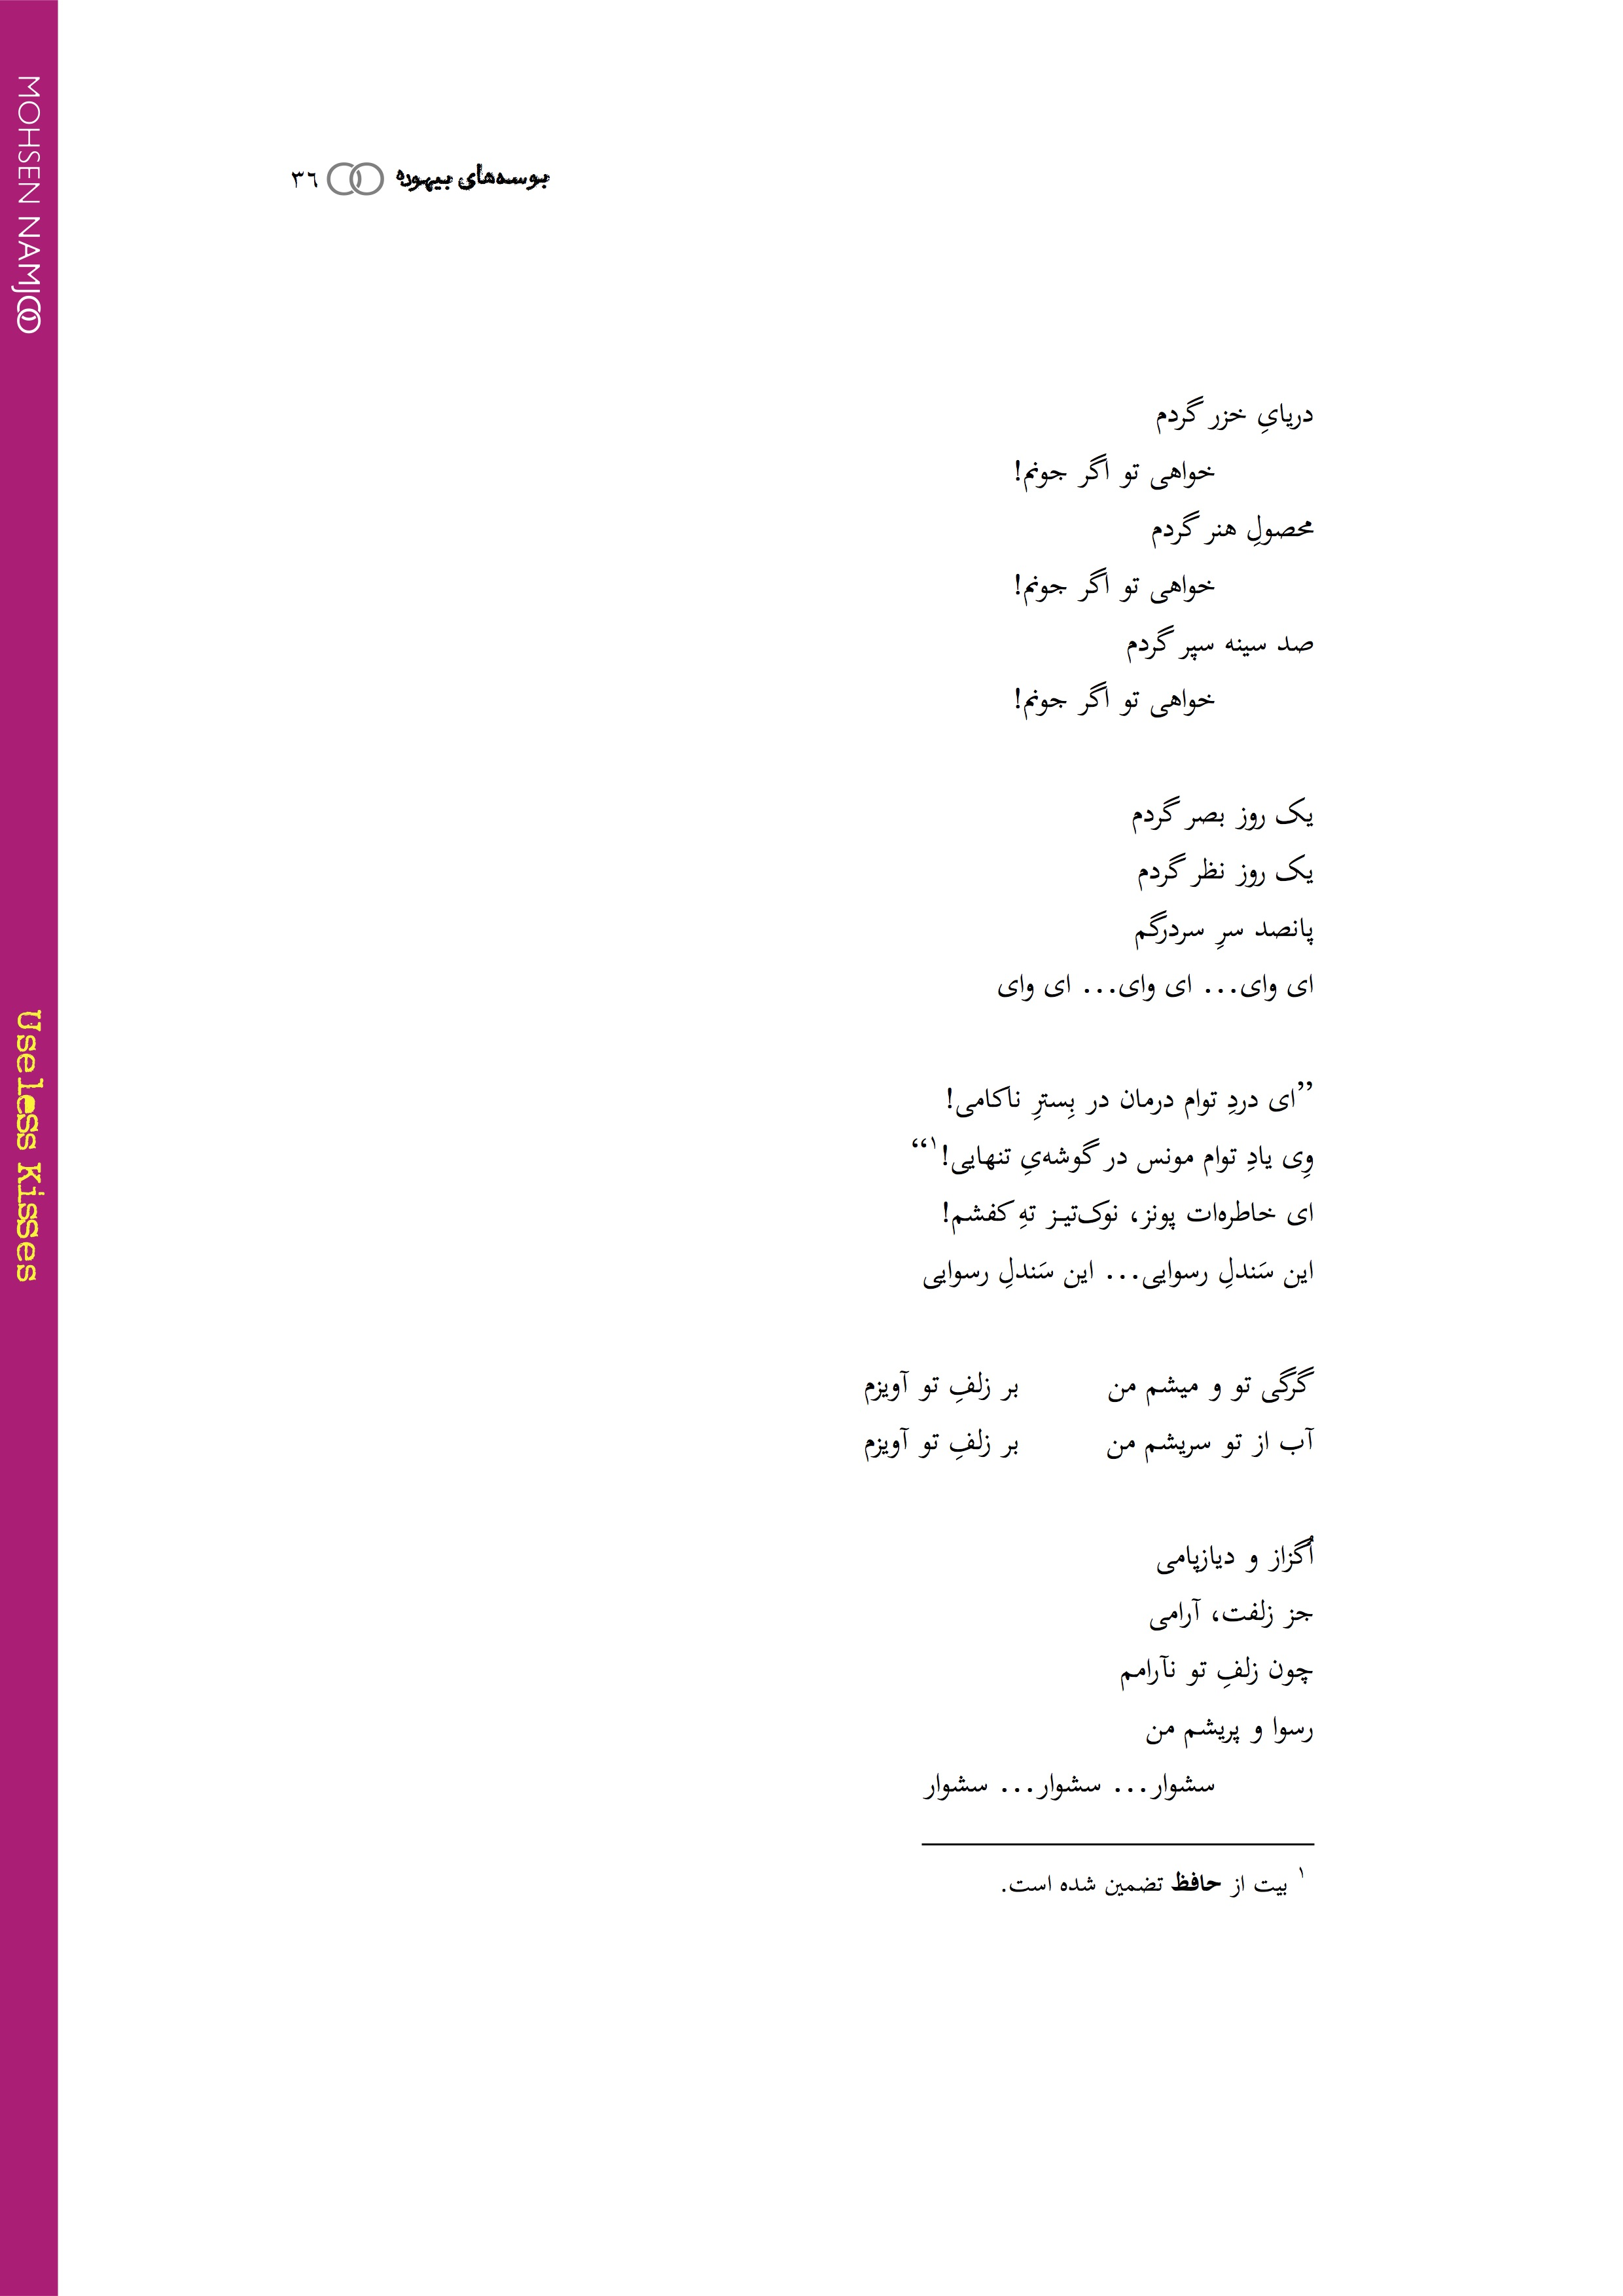 35Useless Kisses eBook (2nd Edition).jpg